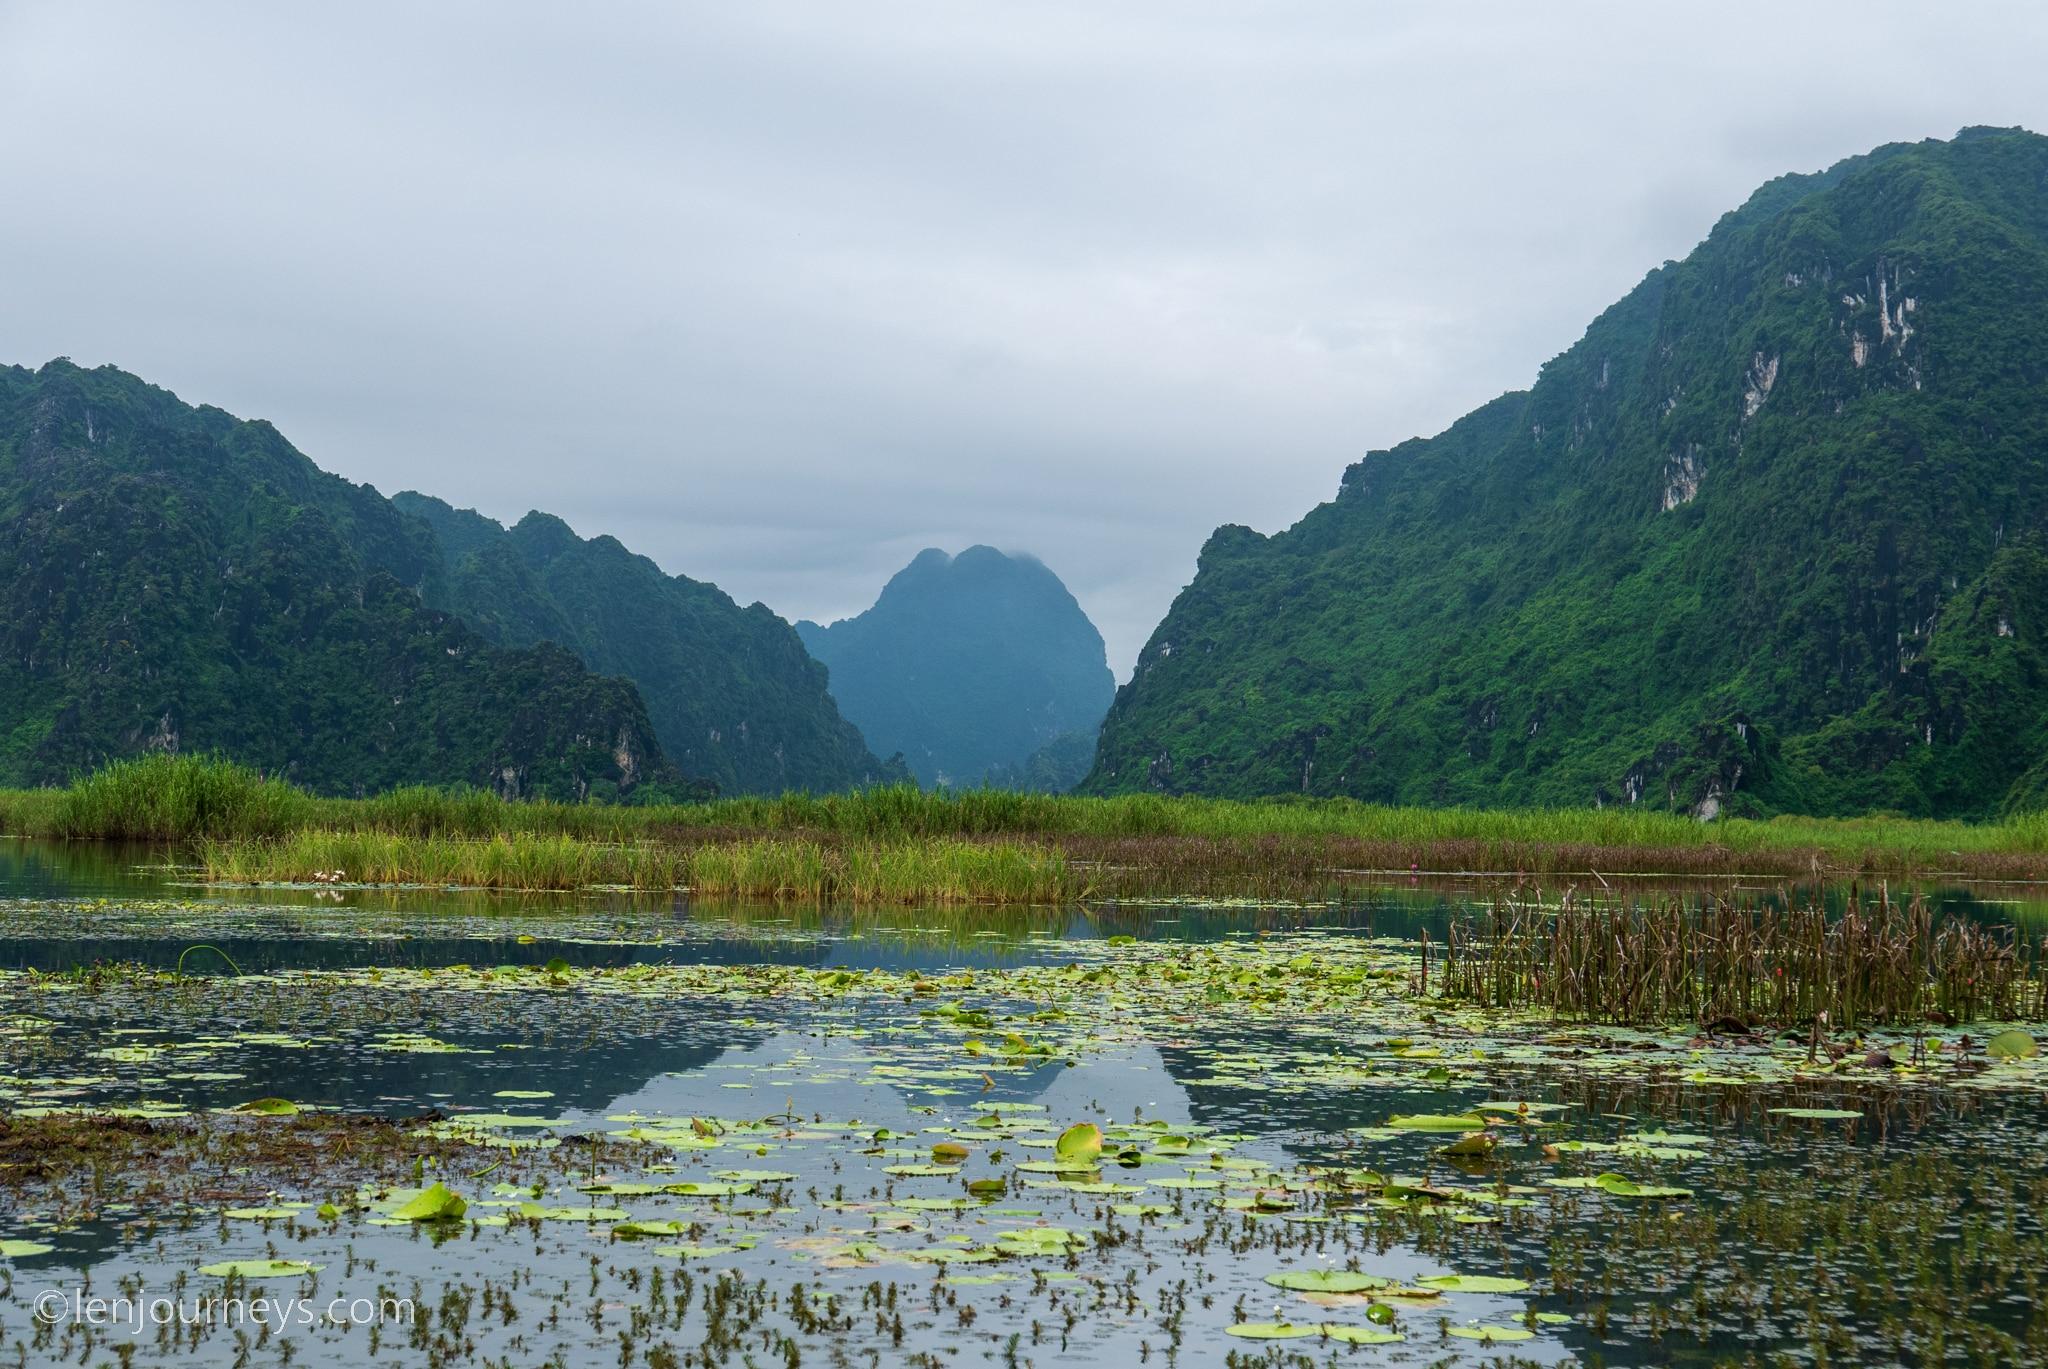 Reedy wetland, Ninh Binh